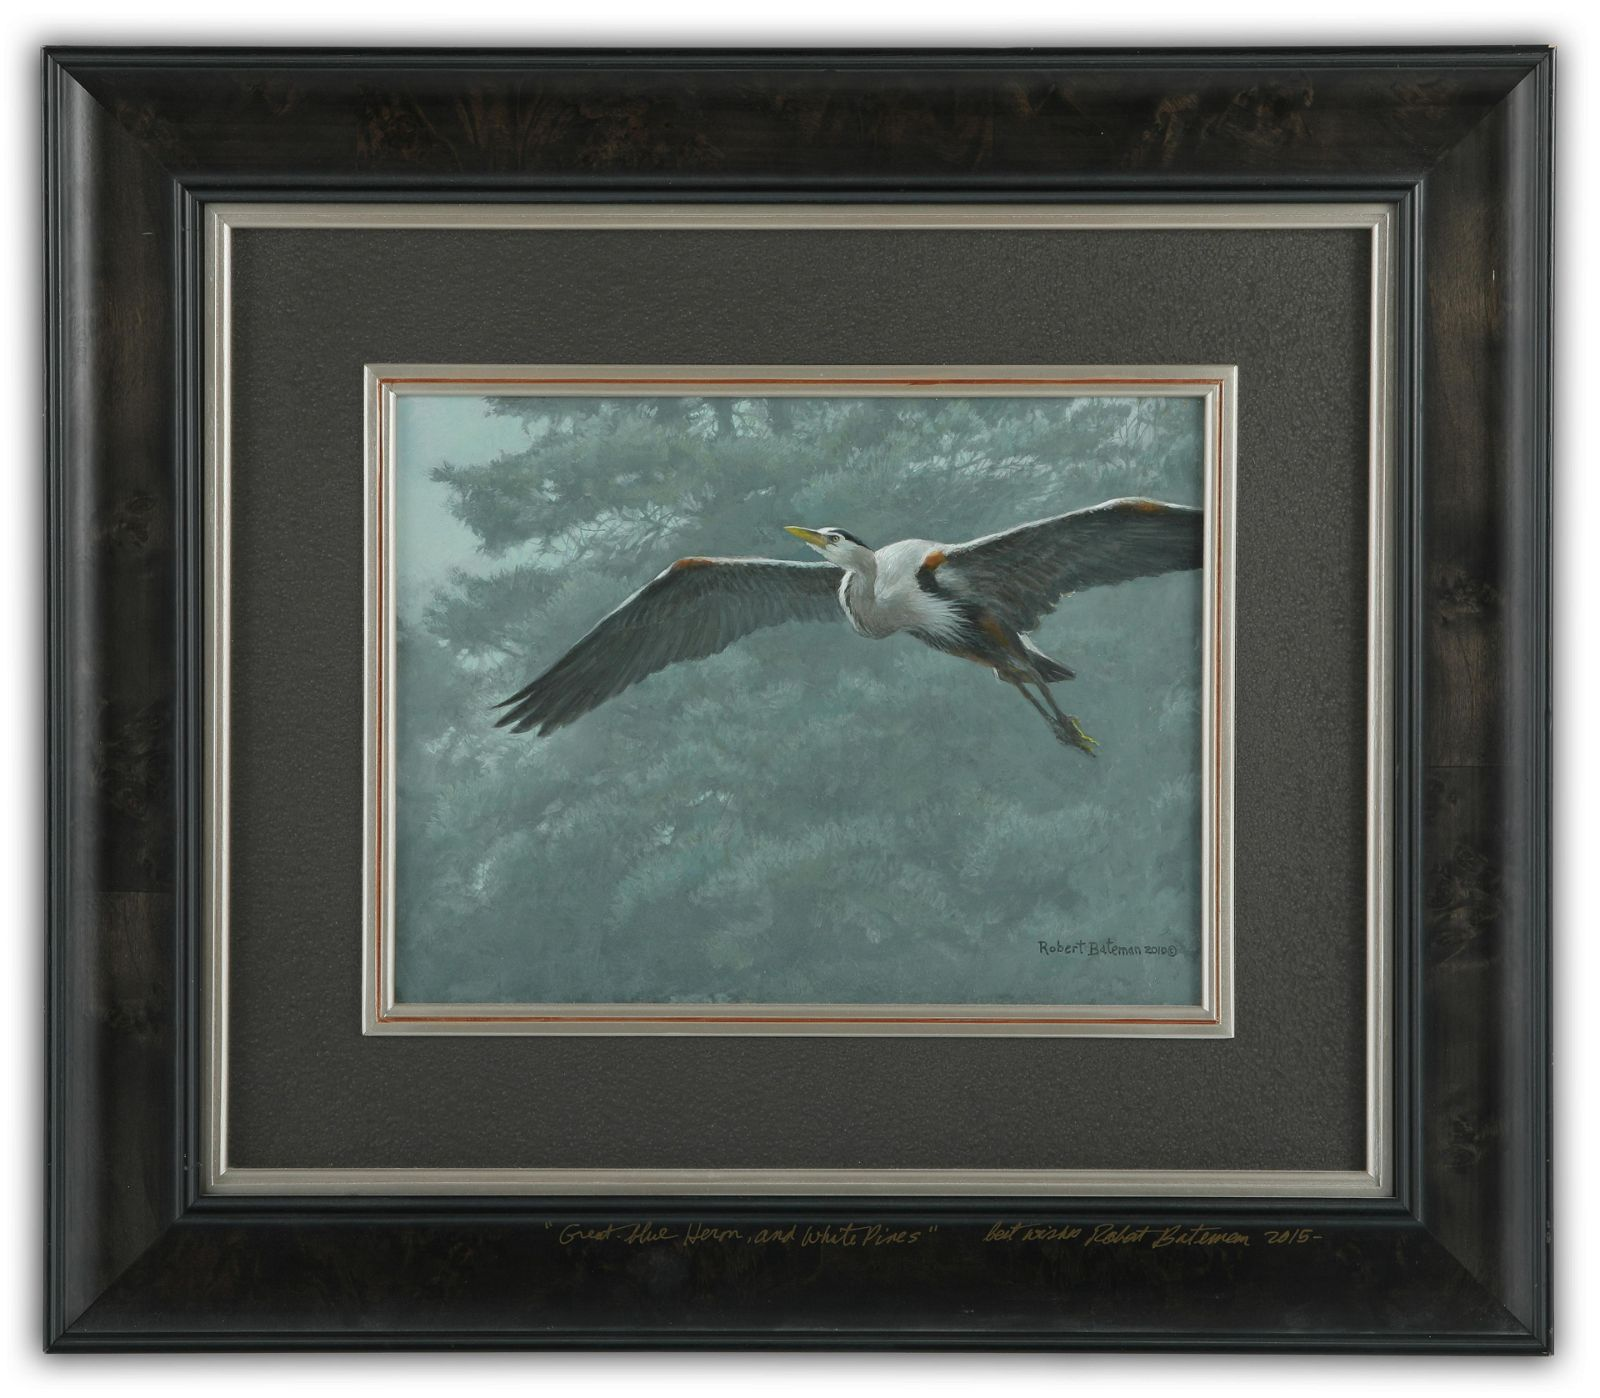 Original Robert Bateman Oil on Board Painting*